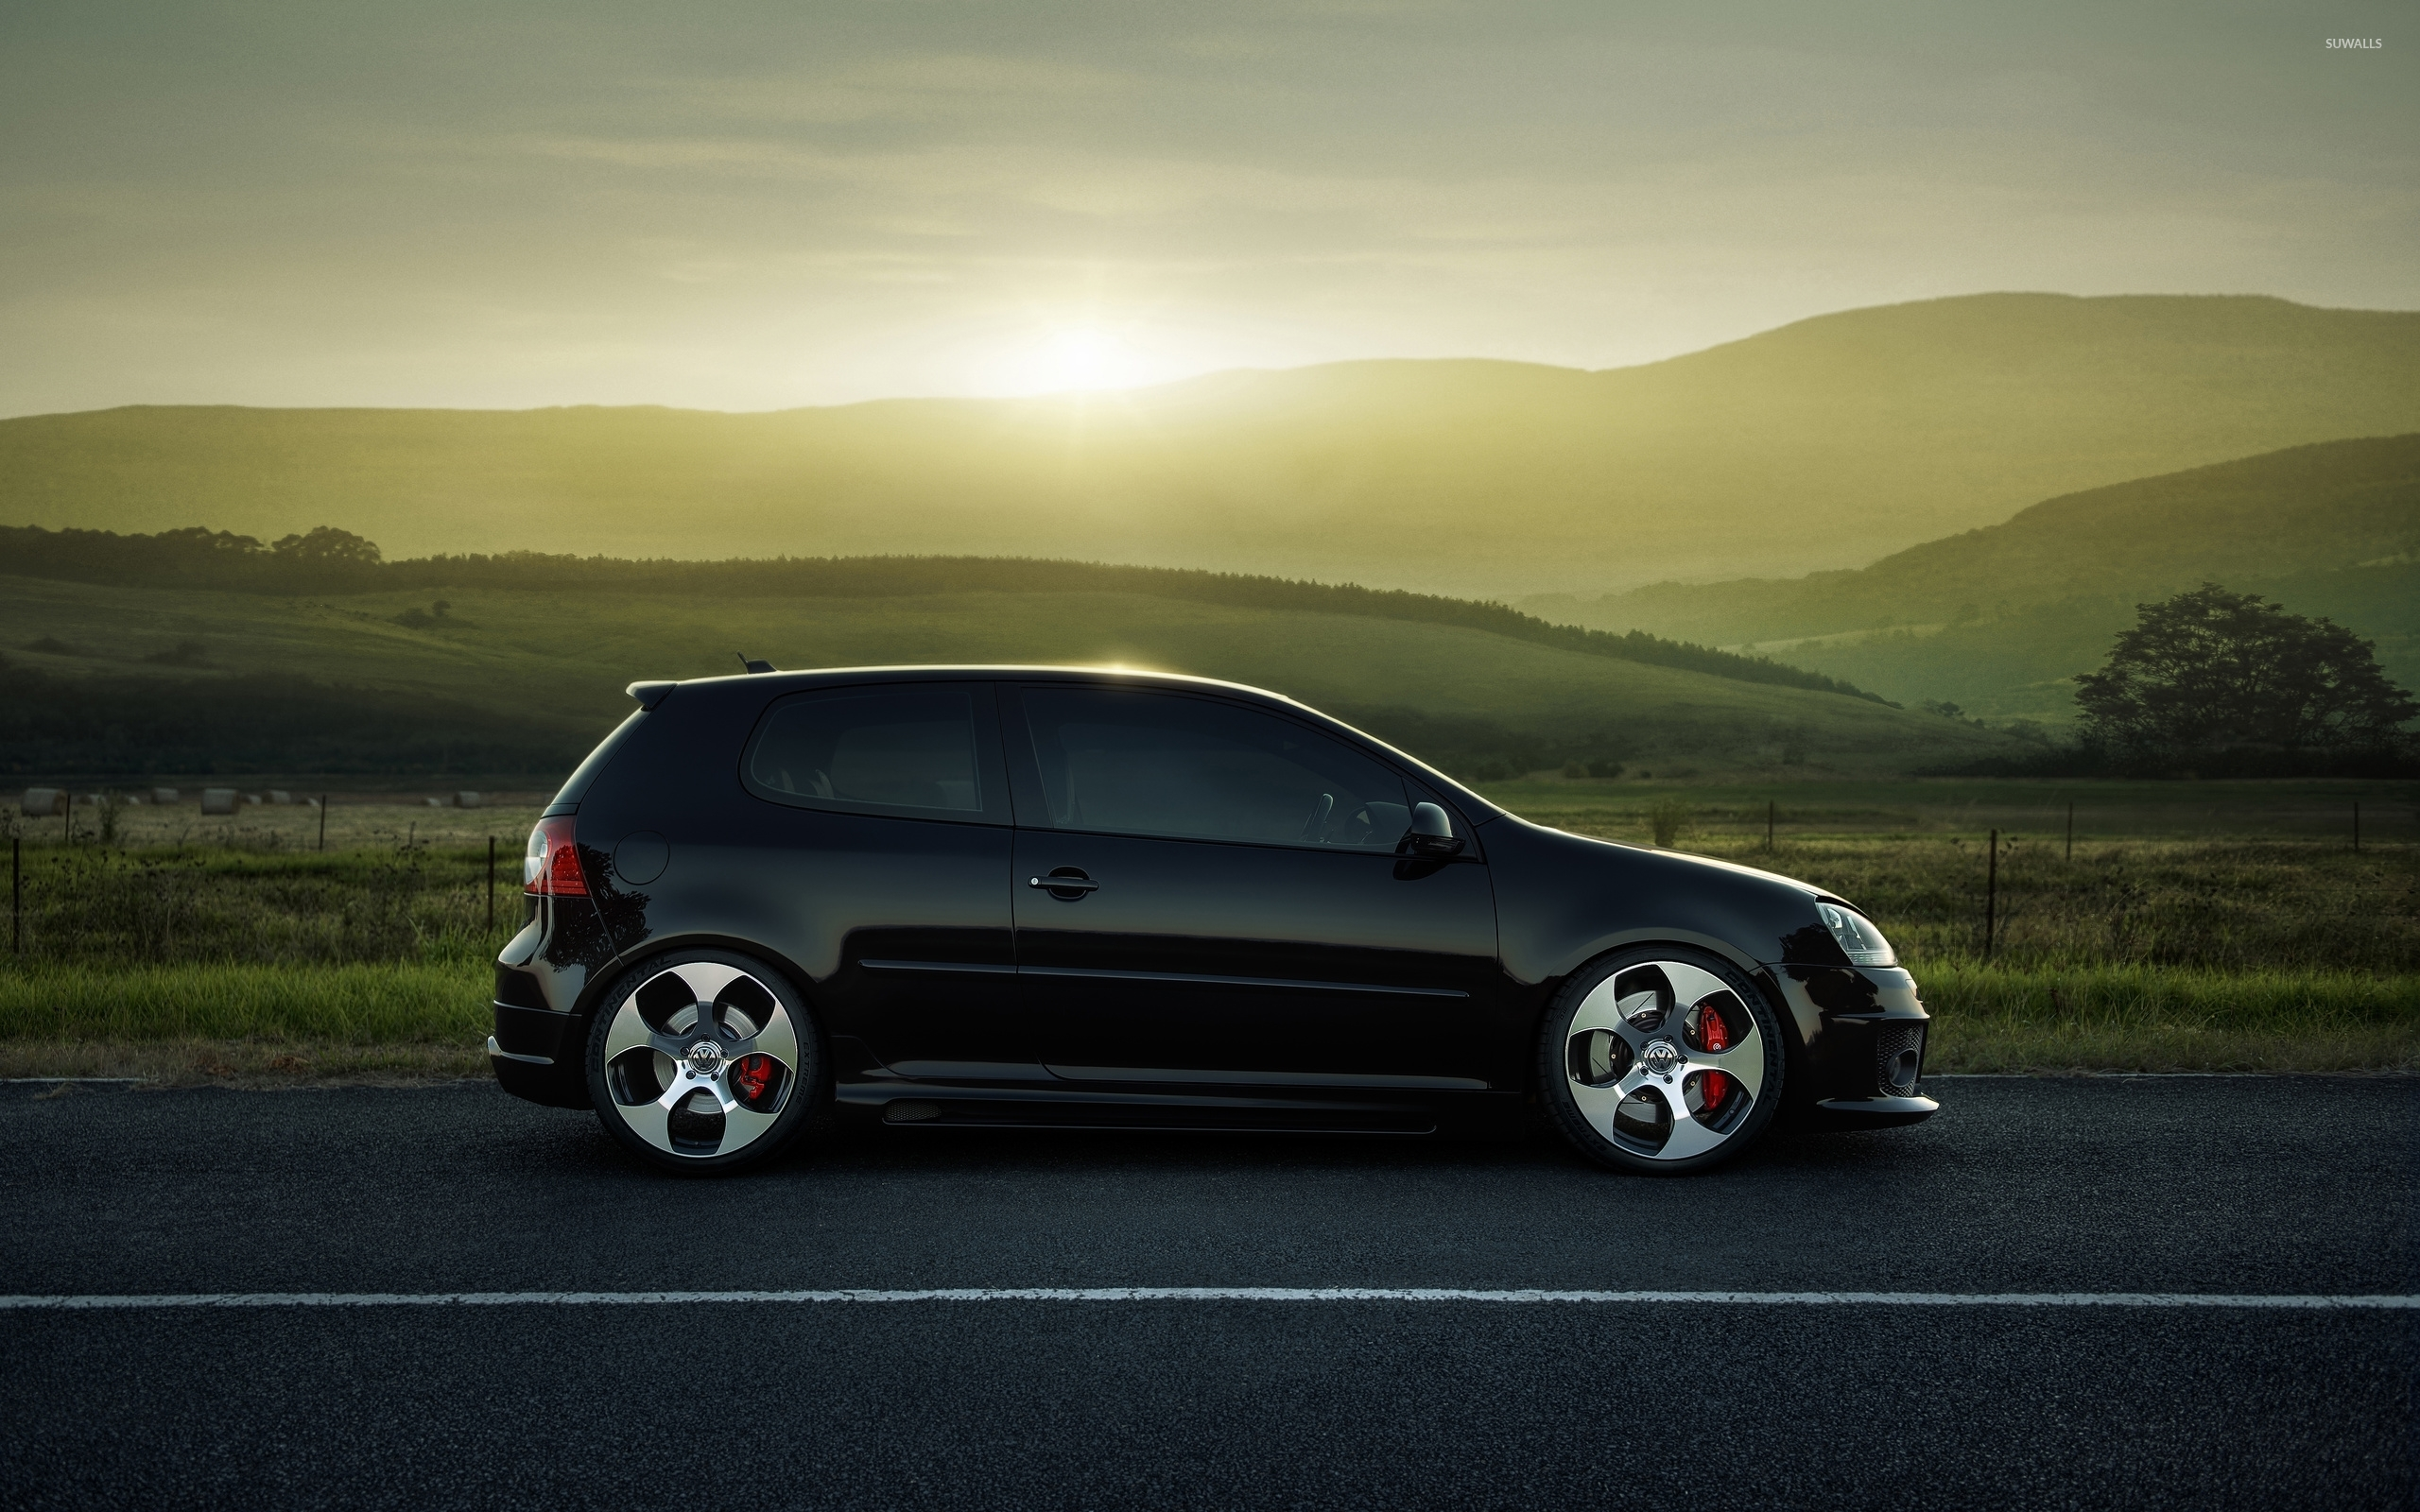 Black Volkswagen Golf Mk5 On The Road Side View Wallpaper